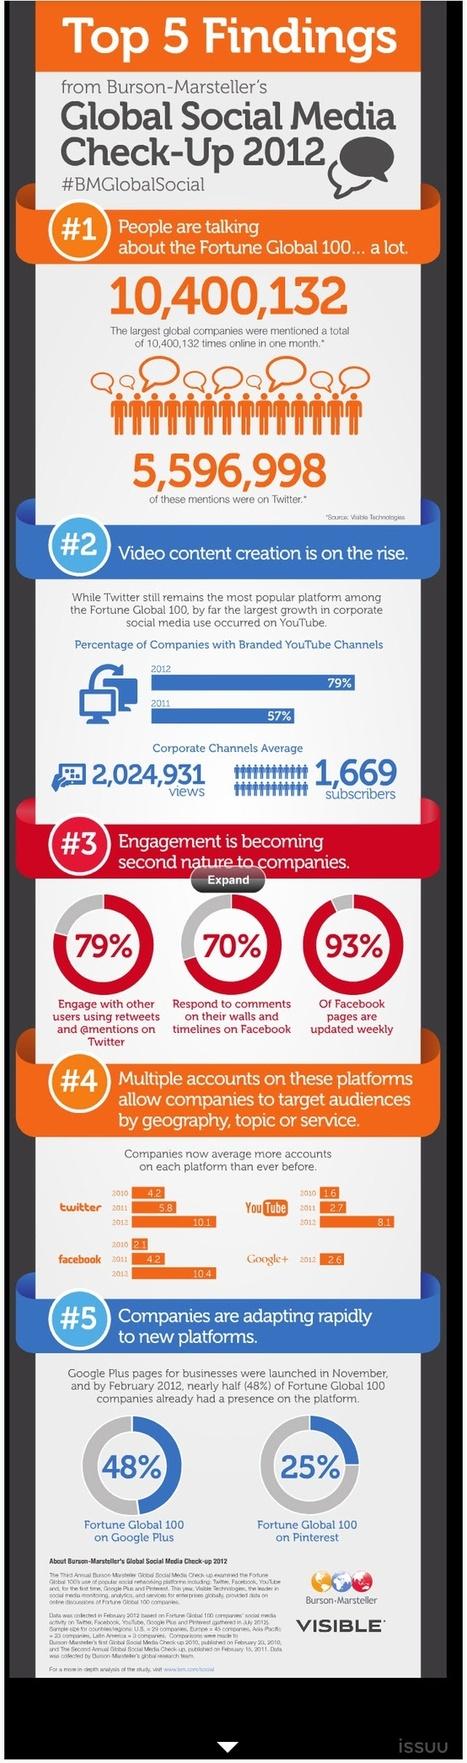 Top Findings:Global Social Media Check - Up 2012 [Infographic] | Social Media Magazine(SMM): Social Media Content Curation & Marketing Strategies | Scoop.it